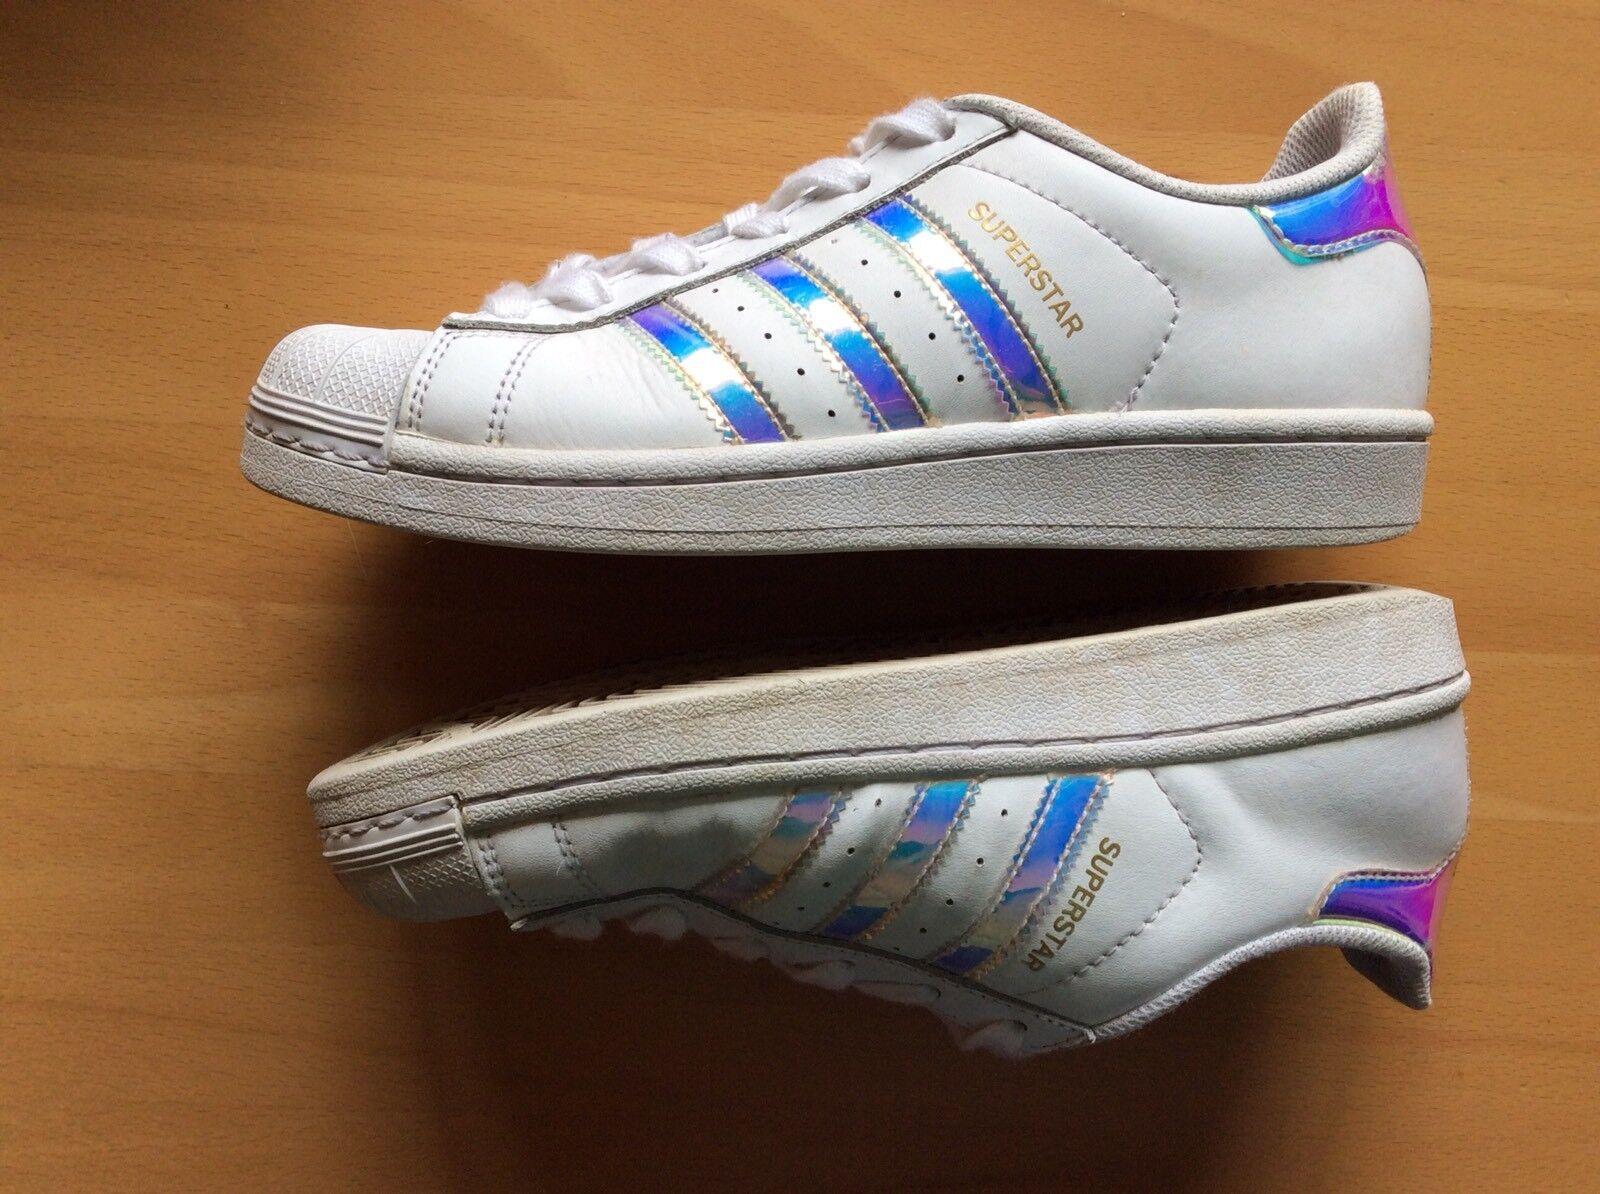 ⭐️ ADIDAS Holo ⭐️ Superstar weiß Holo ADIDAS 36 2/3 Damenschuhe Sneaker Turnschuhe 78ab43